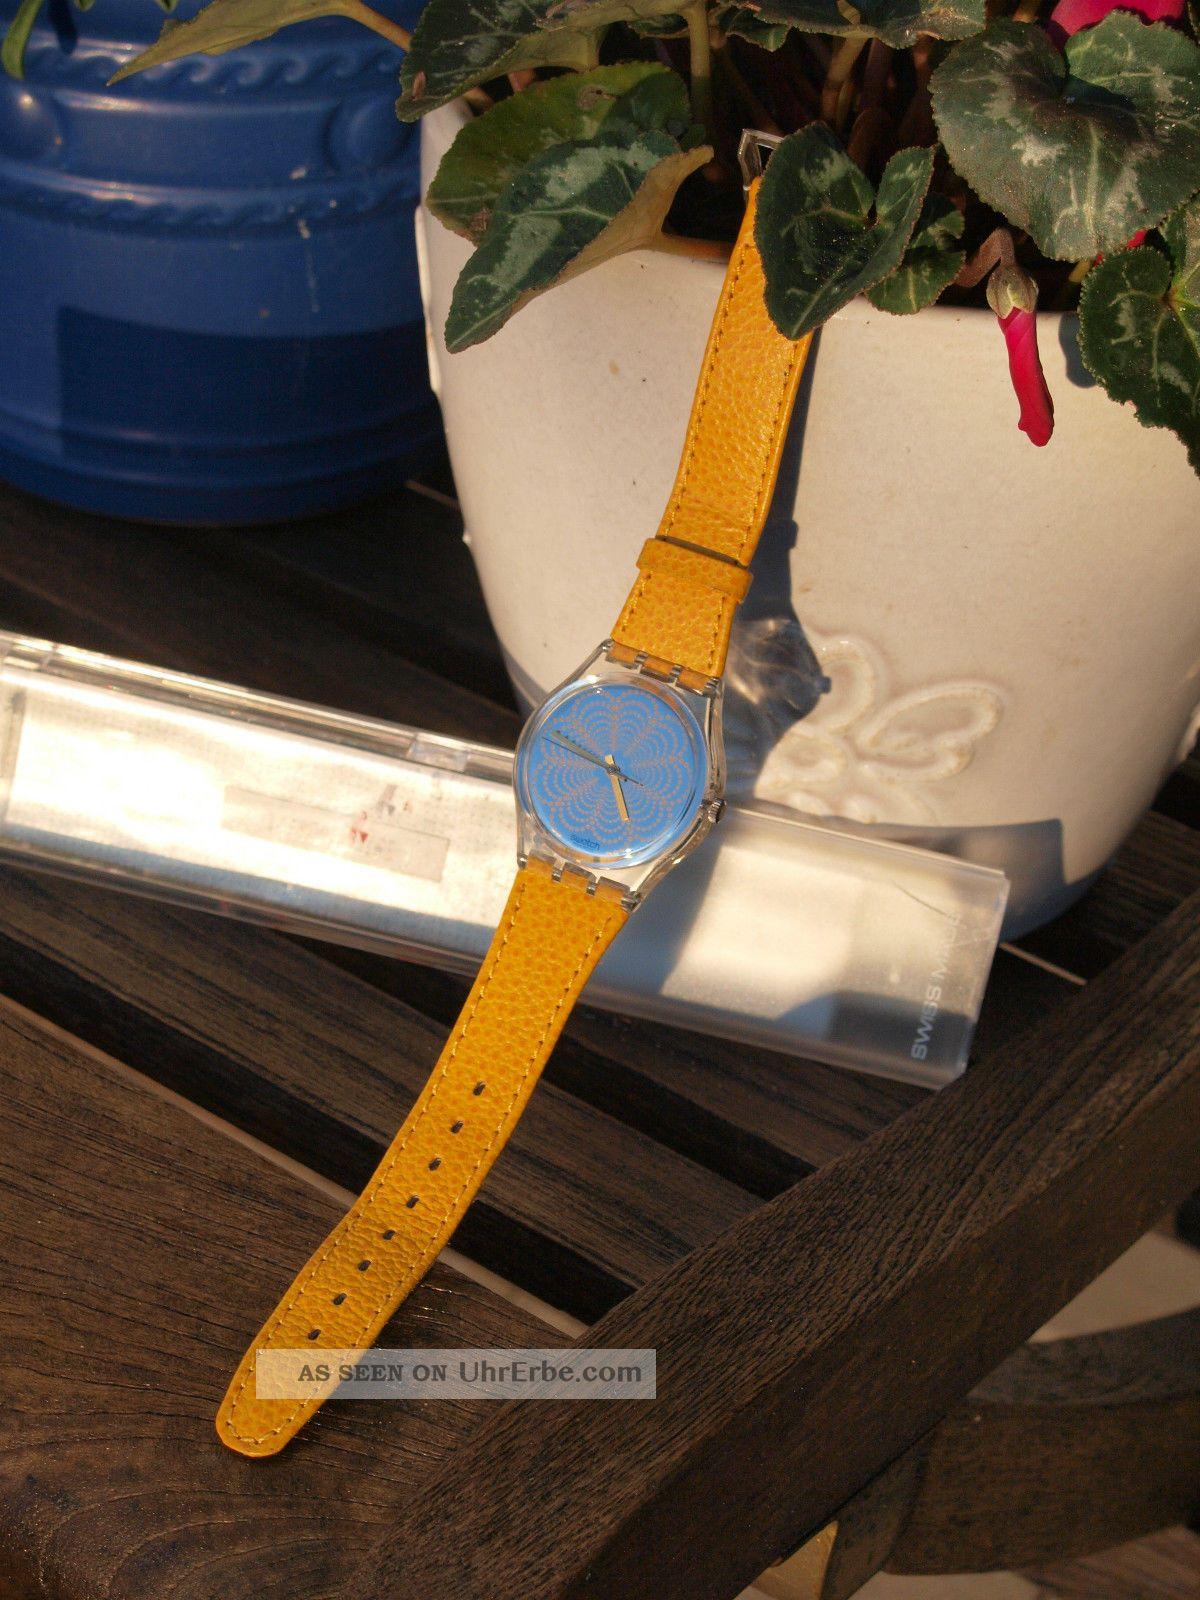 Swatch Damen - Armbanduhr Mit Fetzigem Armband Und Tollem Zifferblatt Armbanduhren Bild